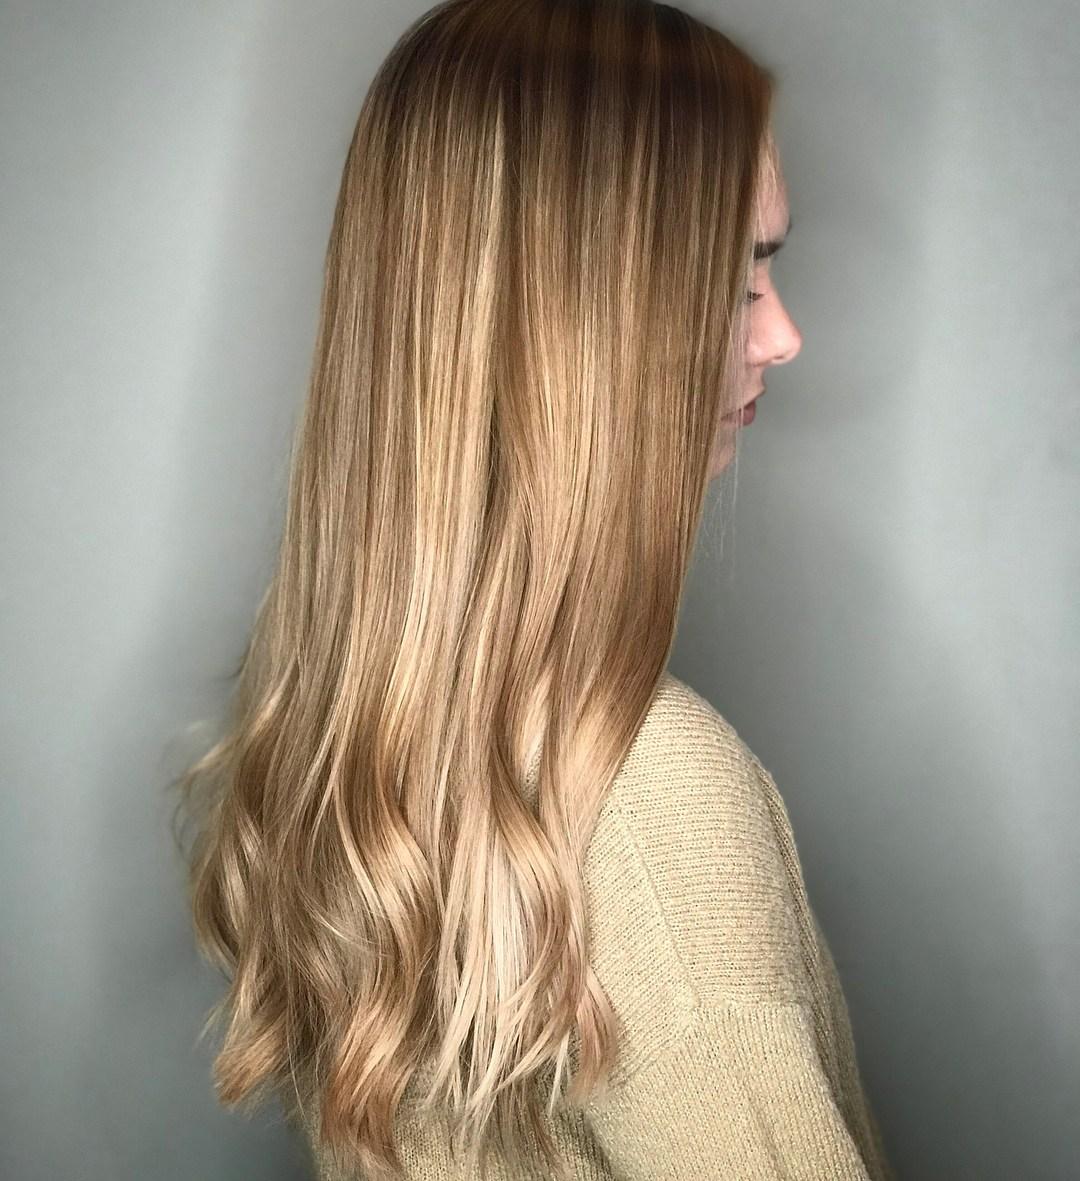 Hair Glaze vs. Hair Gloss: Which Treatment Is Best for Dull Hair?